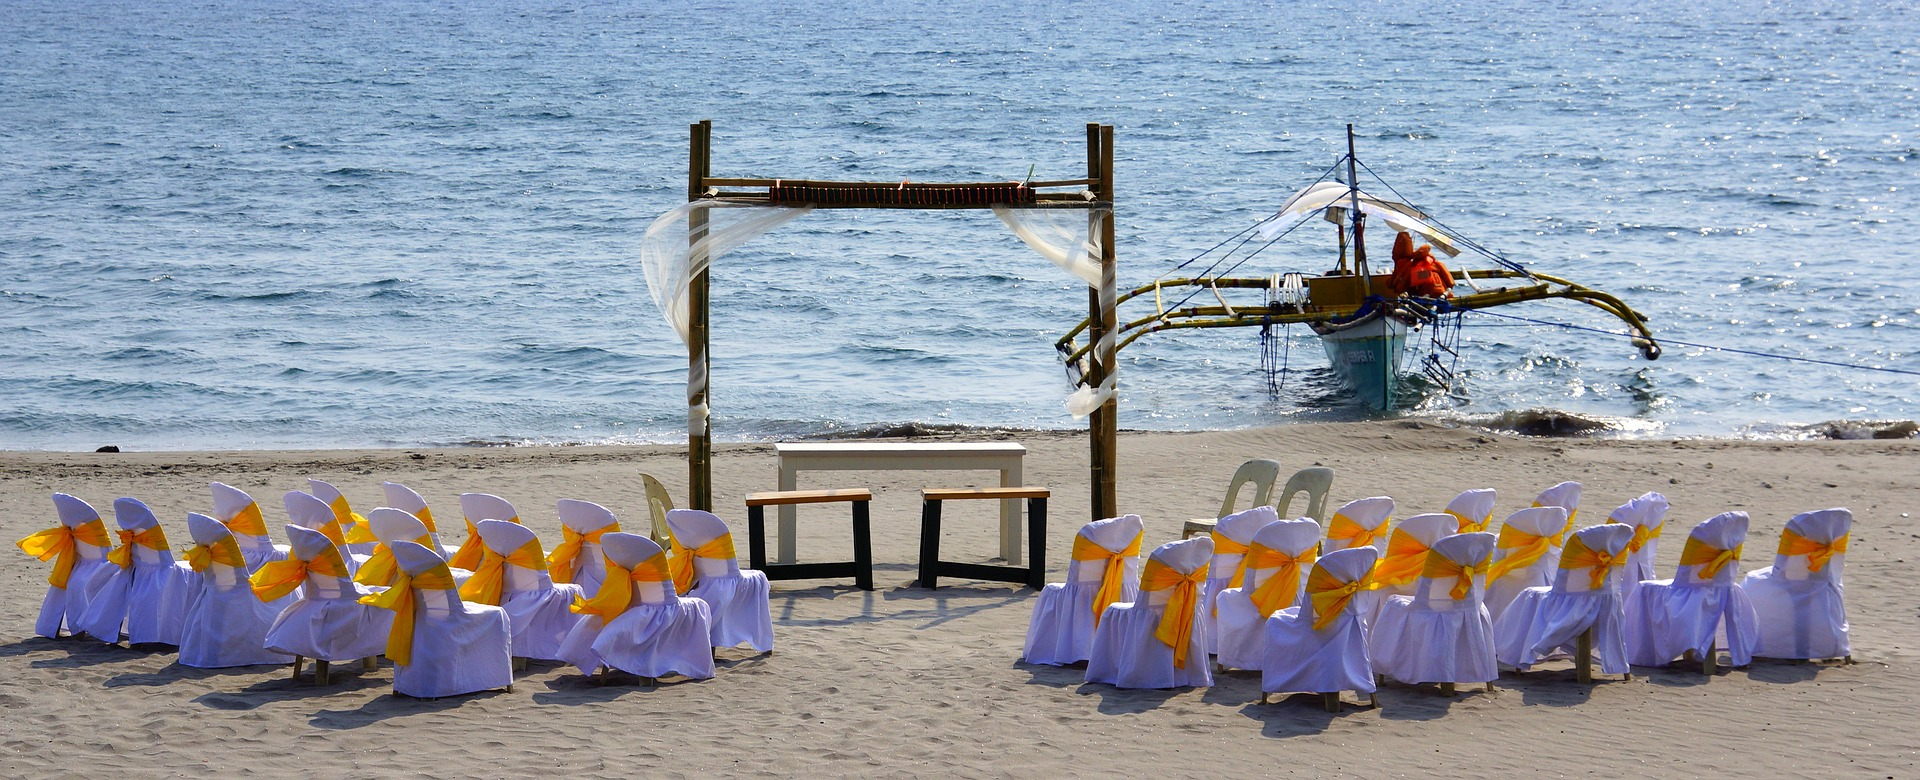 Philippine wedding on the beach.